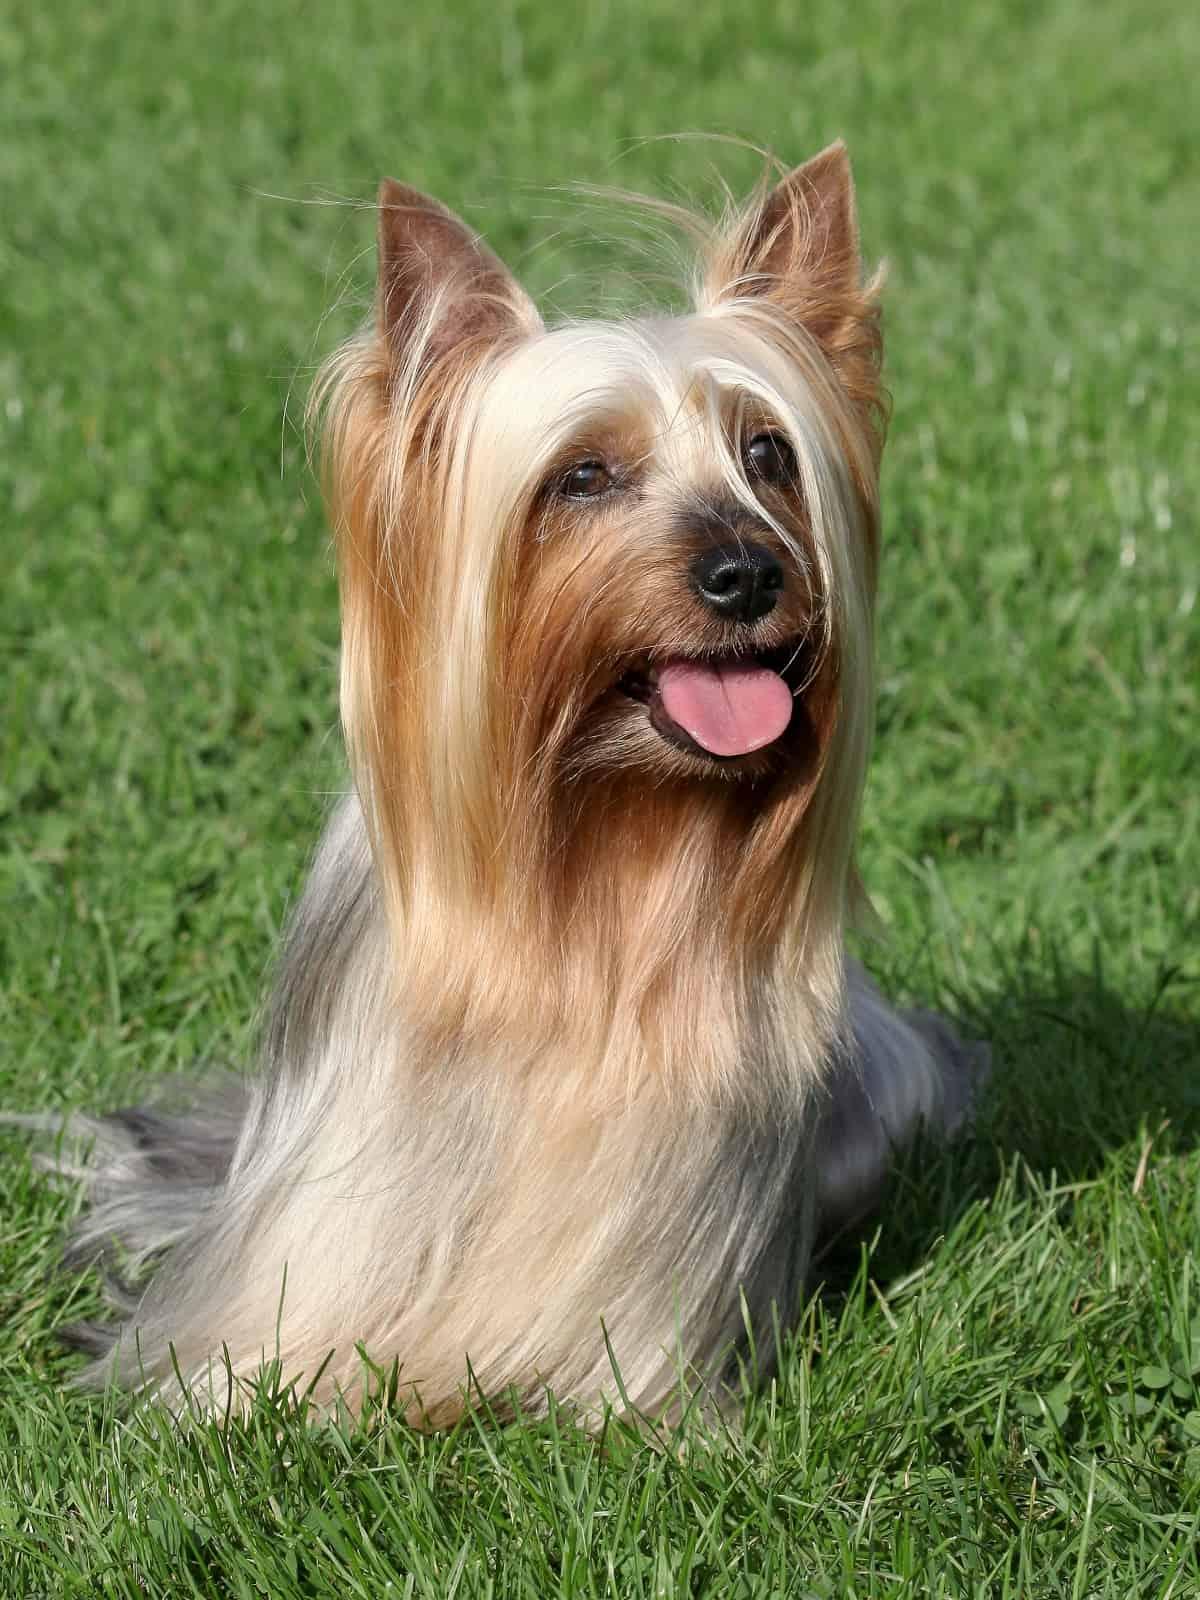 Australian Silky Terrier on the grass